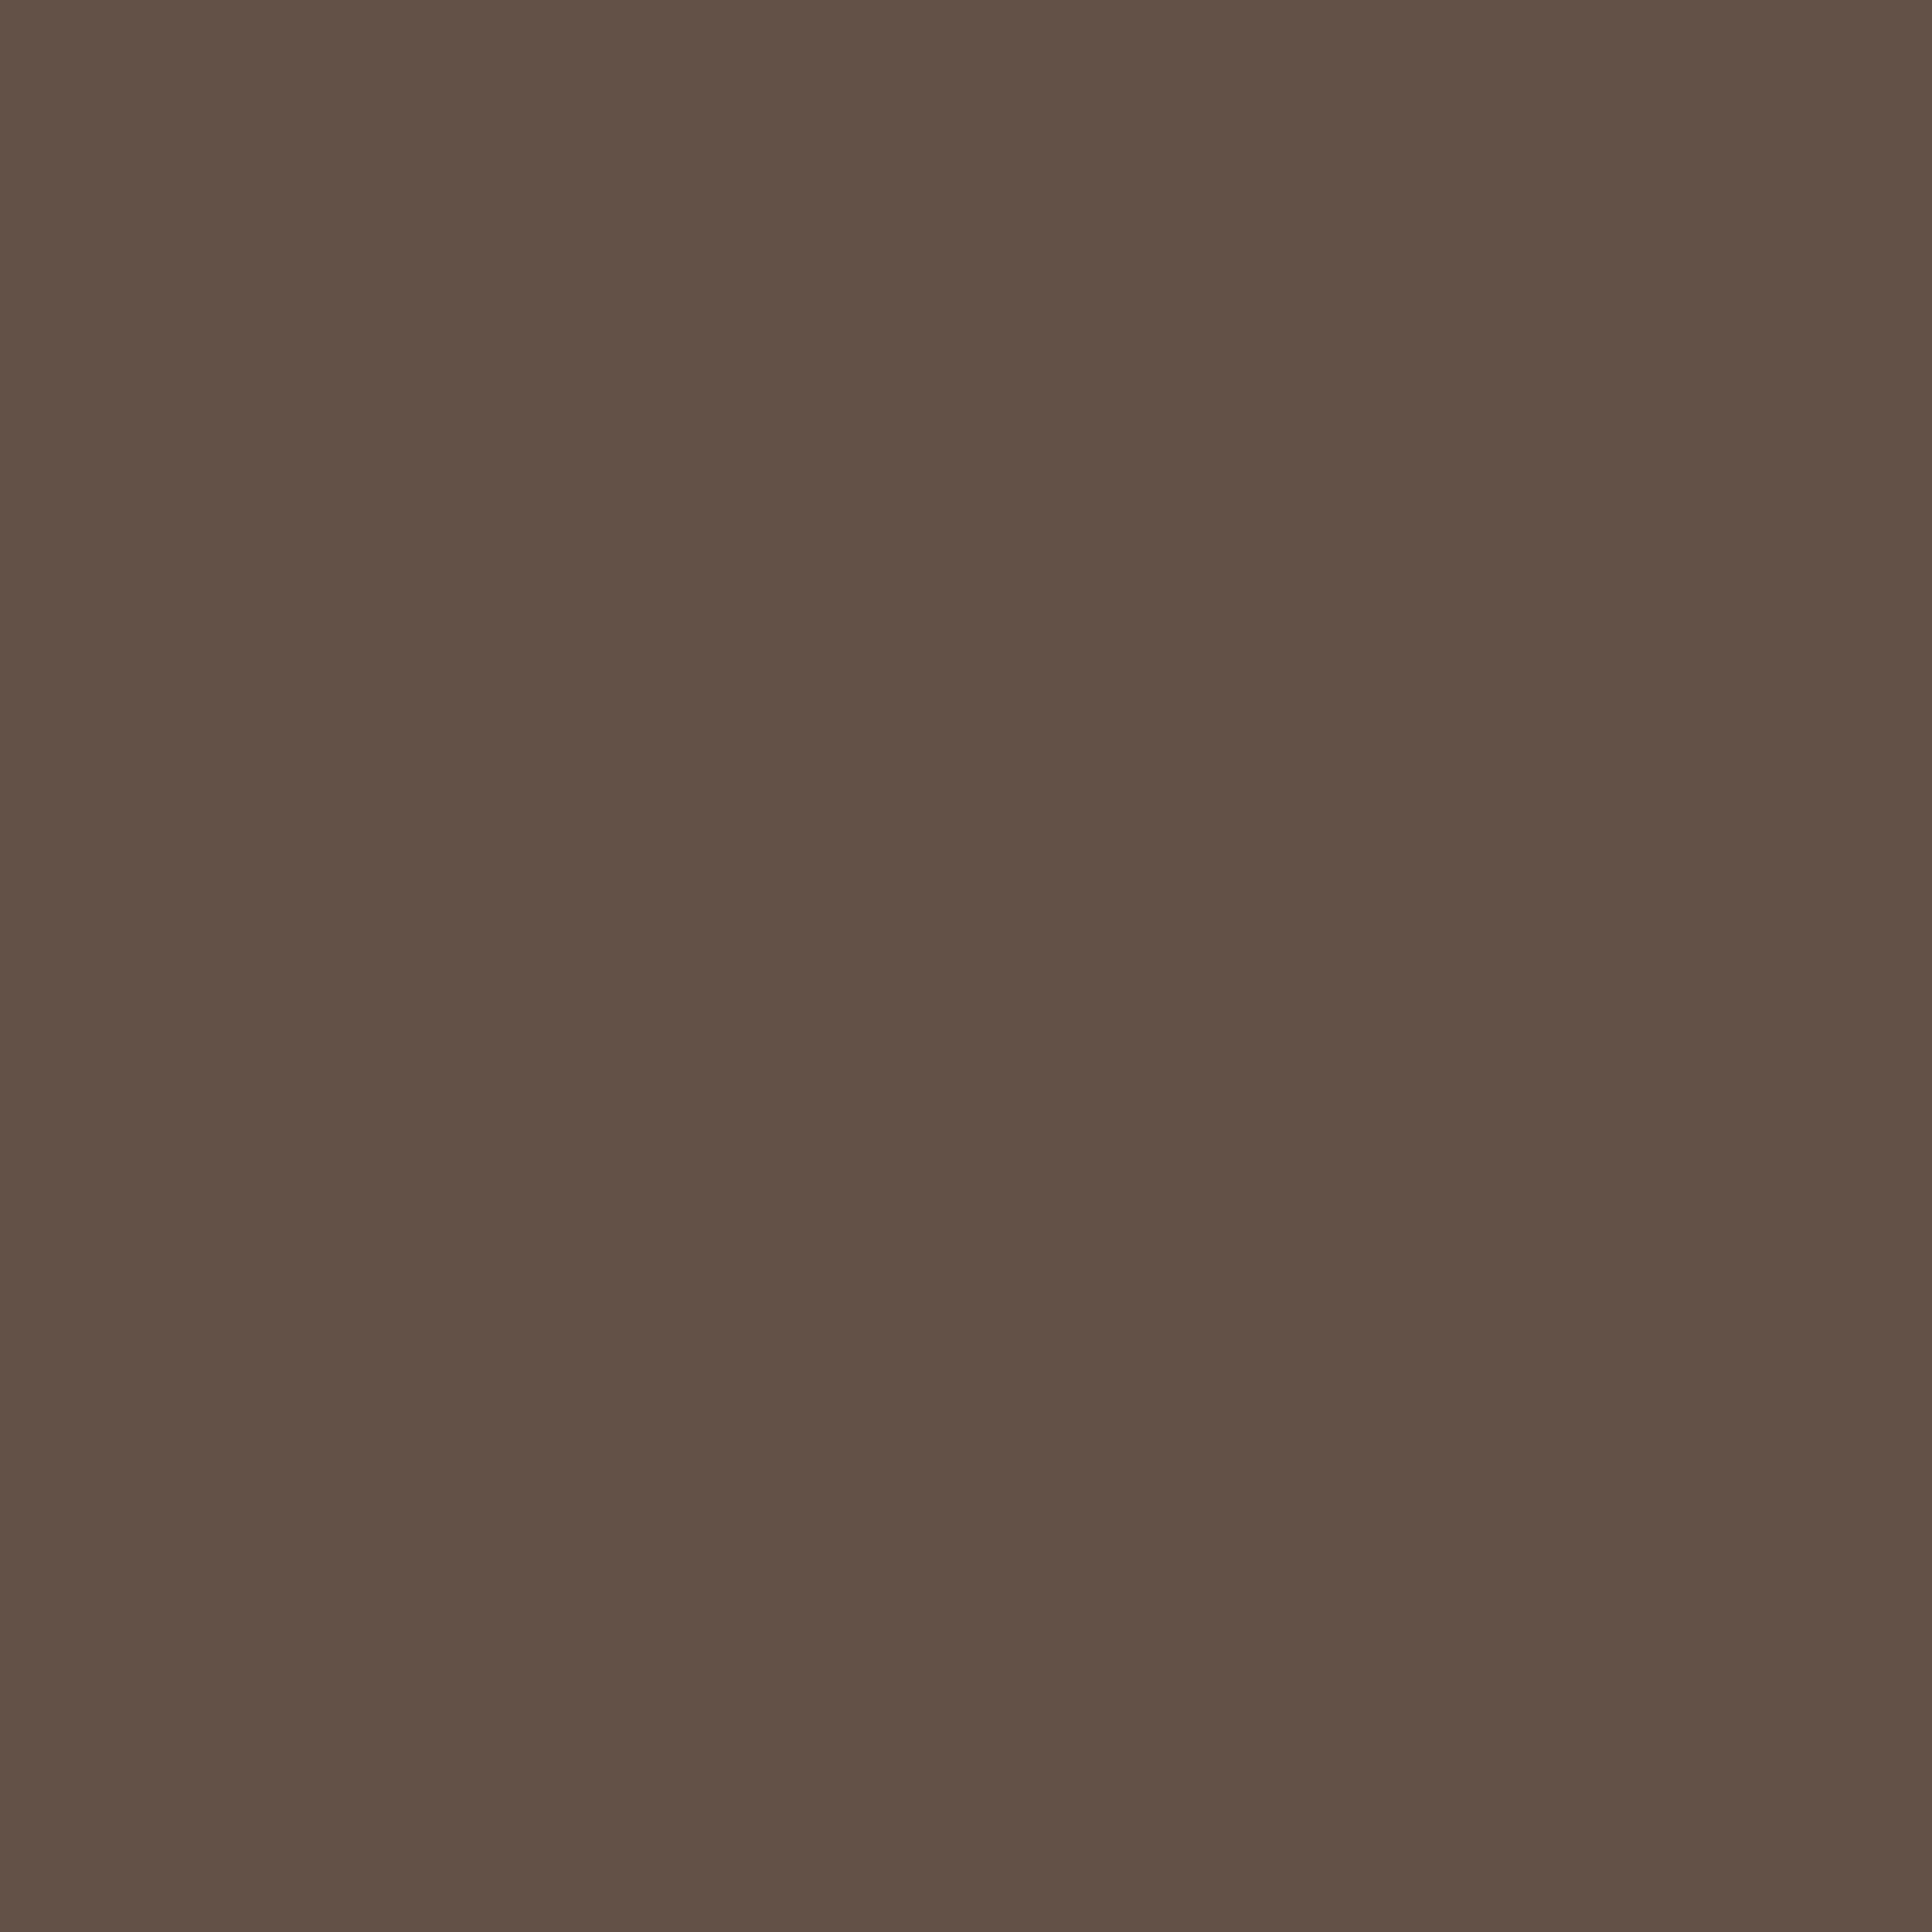 3600x3600 Umber Solid Color Background